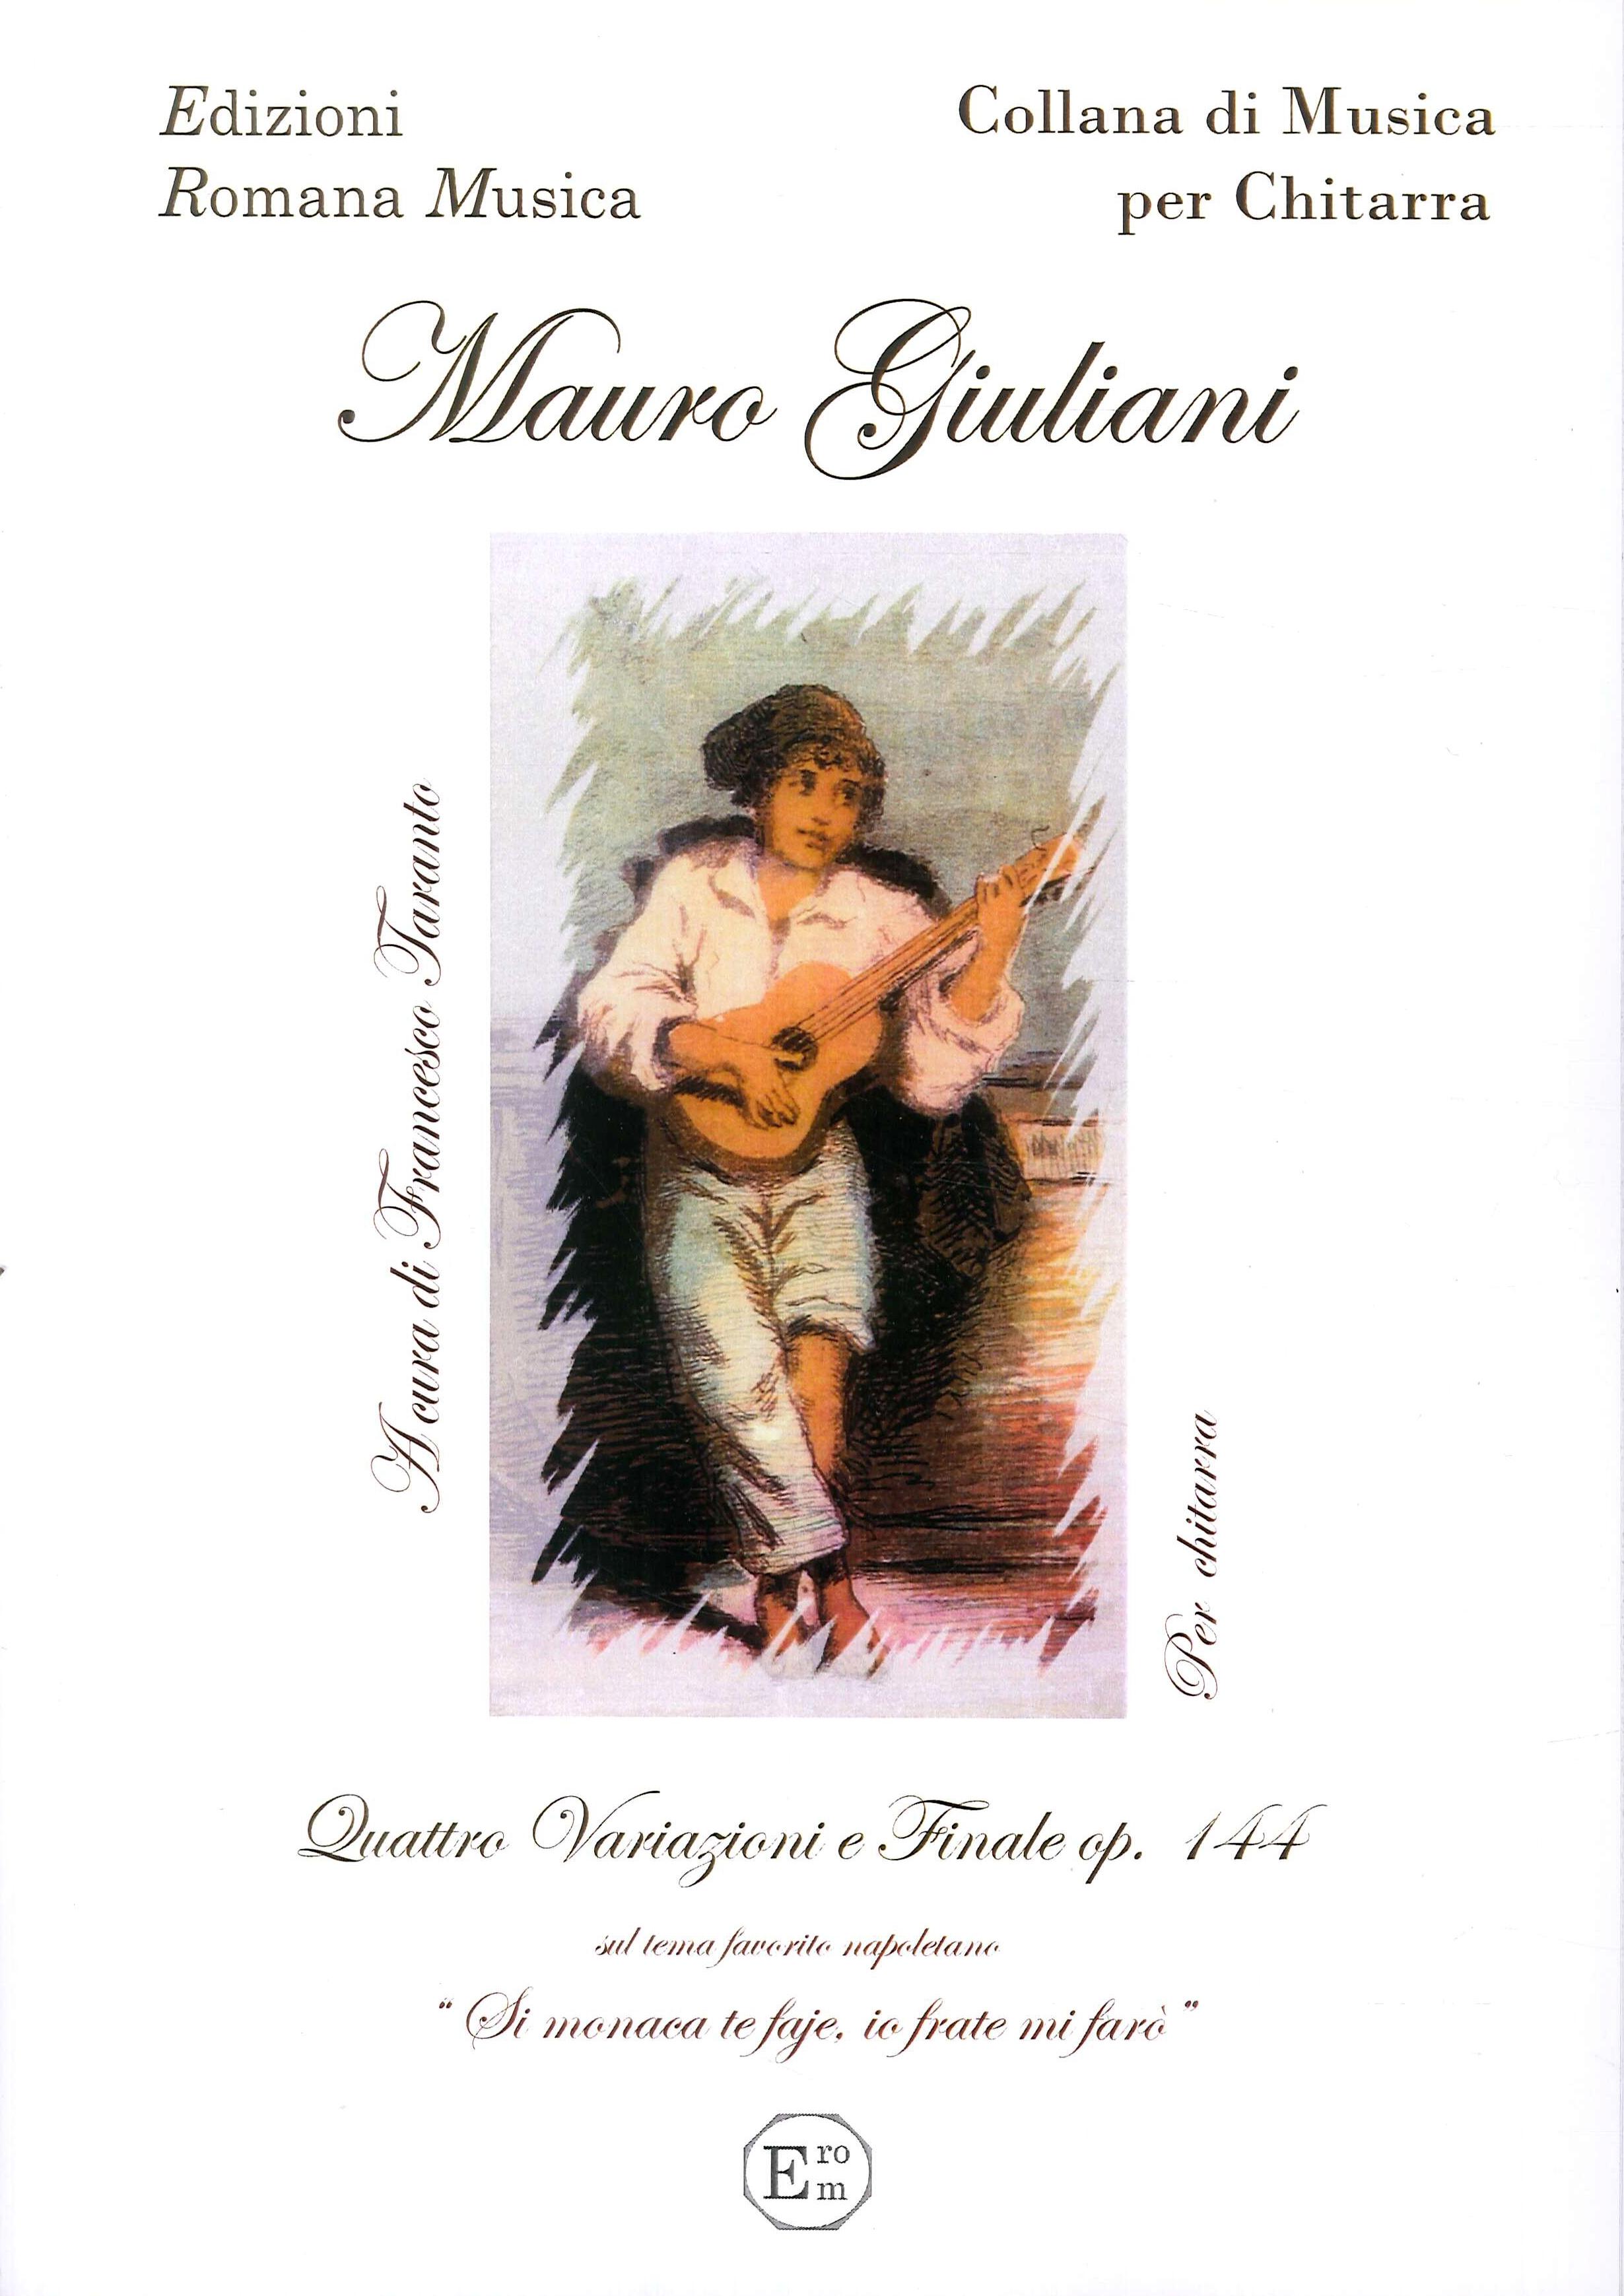 Mauro Giuliani. Quattro Variazioni e Finale Op. 144. Musica per Chitarra. Erom 0039.